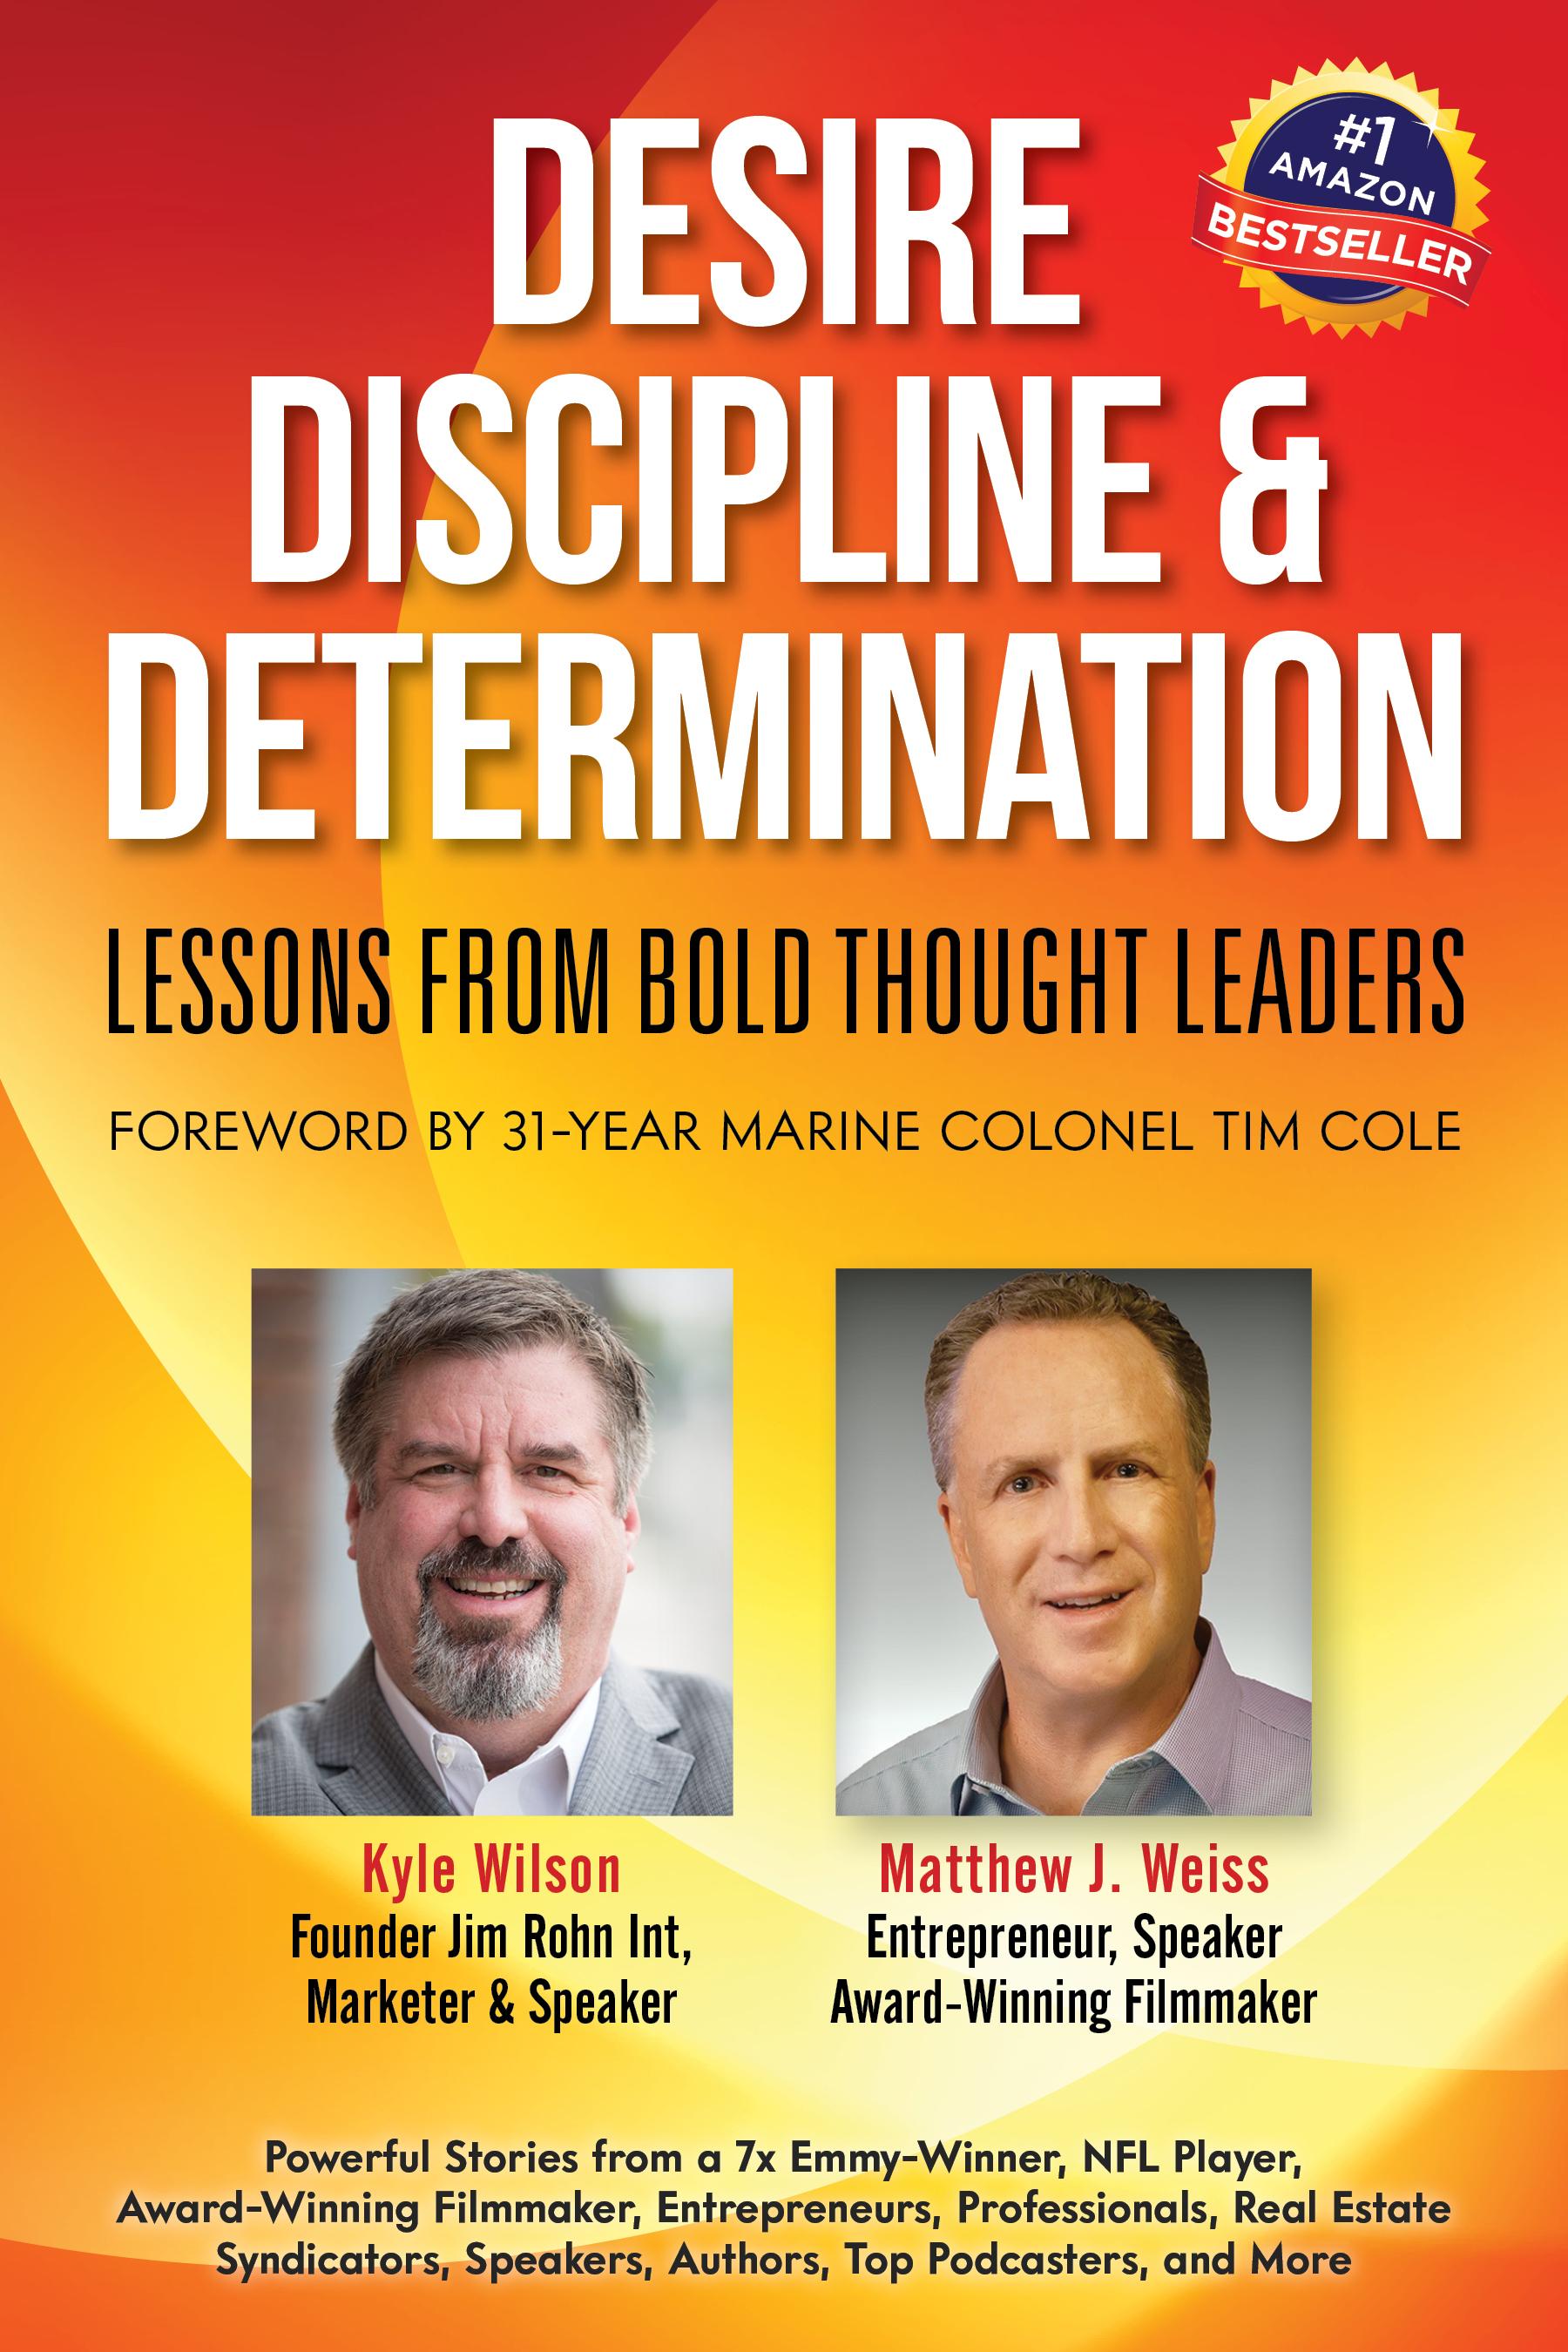 DDD Bestseller cover Kyle and Matthew.jpg